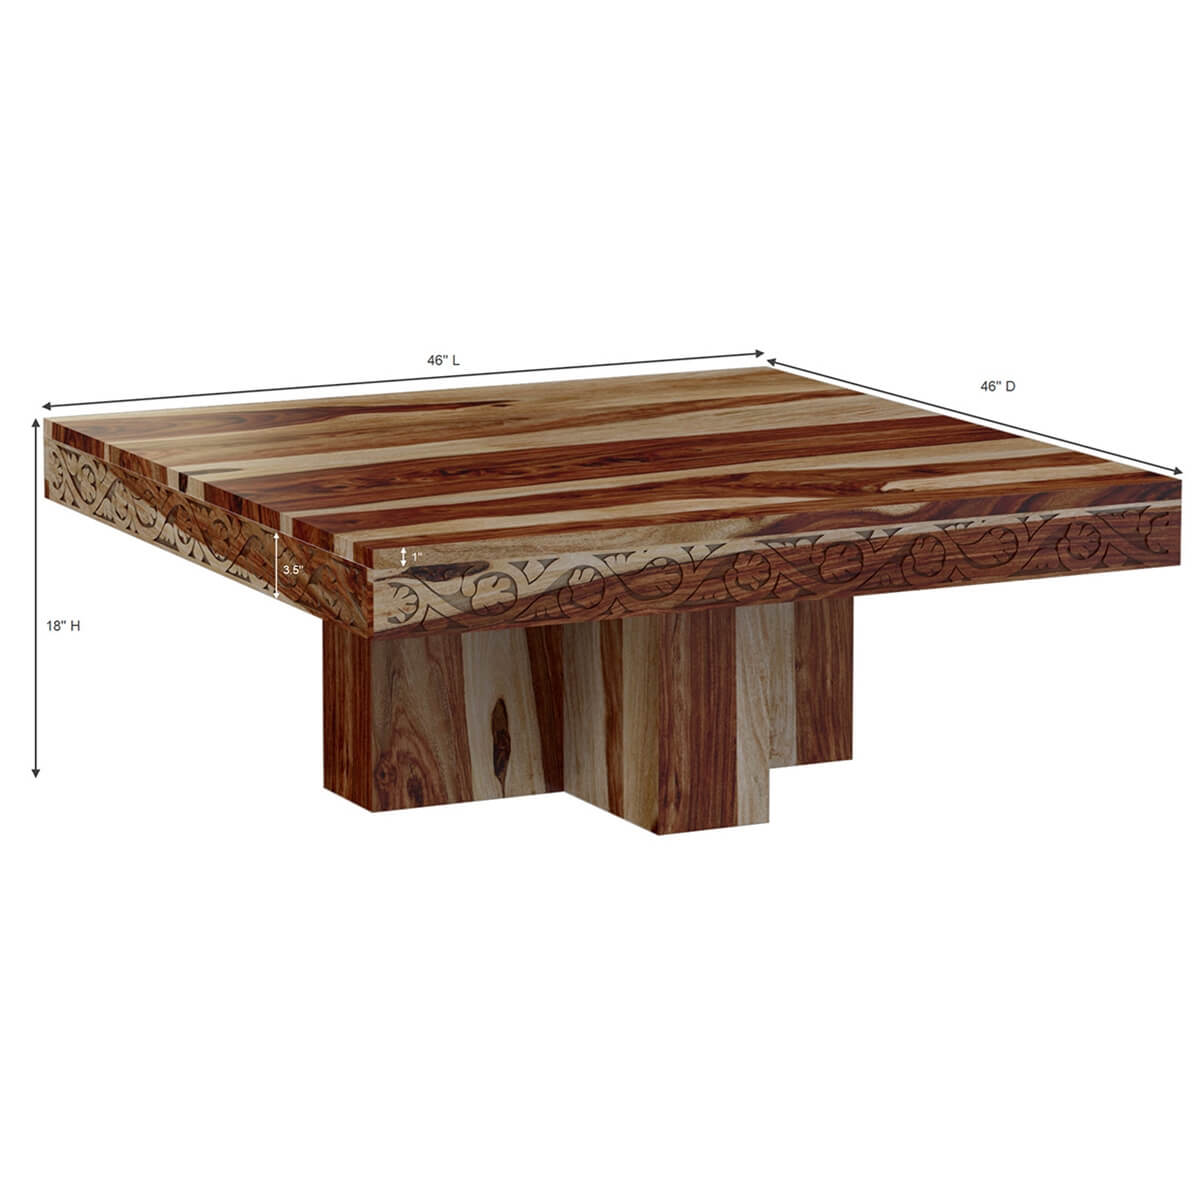 Dallas midnight 46 solid wood square pedestal rustic coffee table dallas midnight 46 solid wood square pedestal rustic coffee table geotapseo Gallery